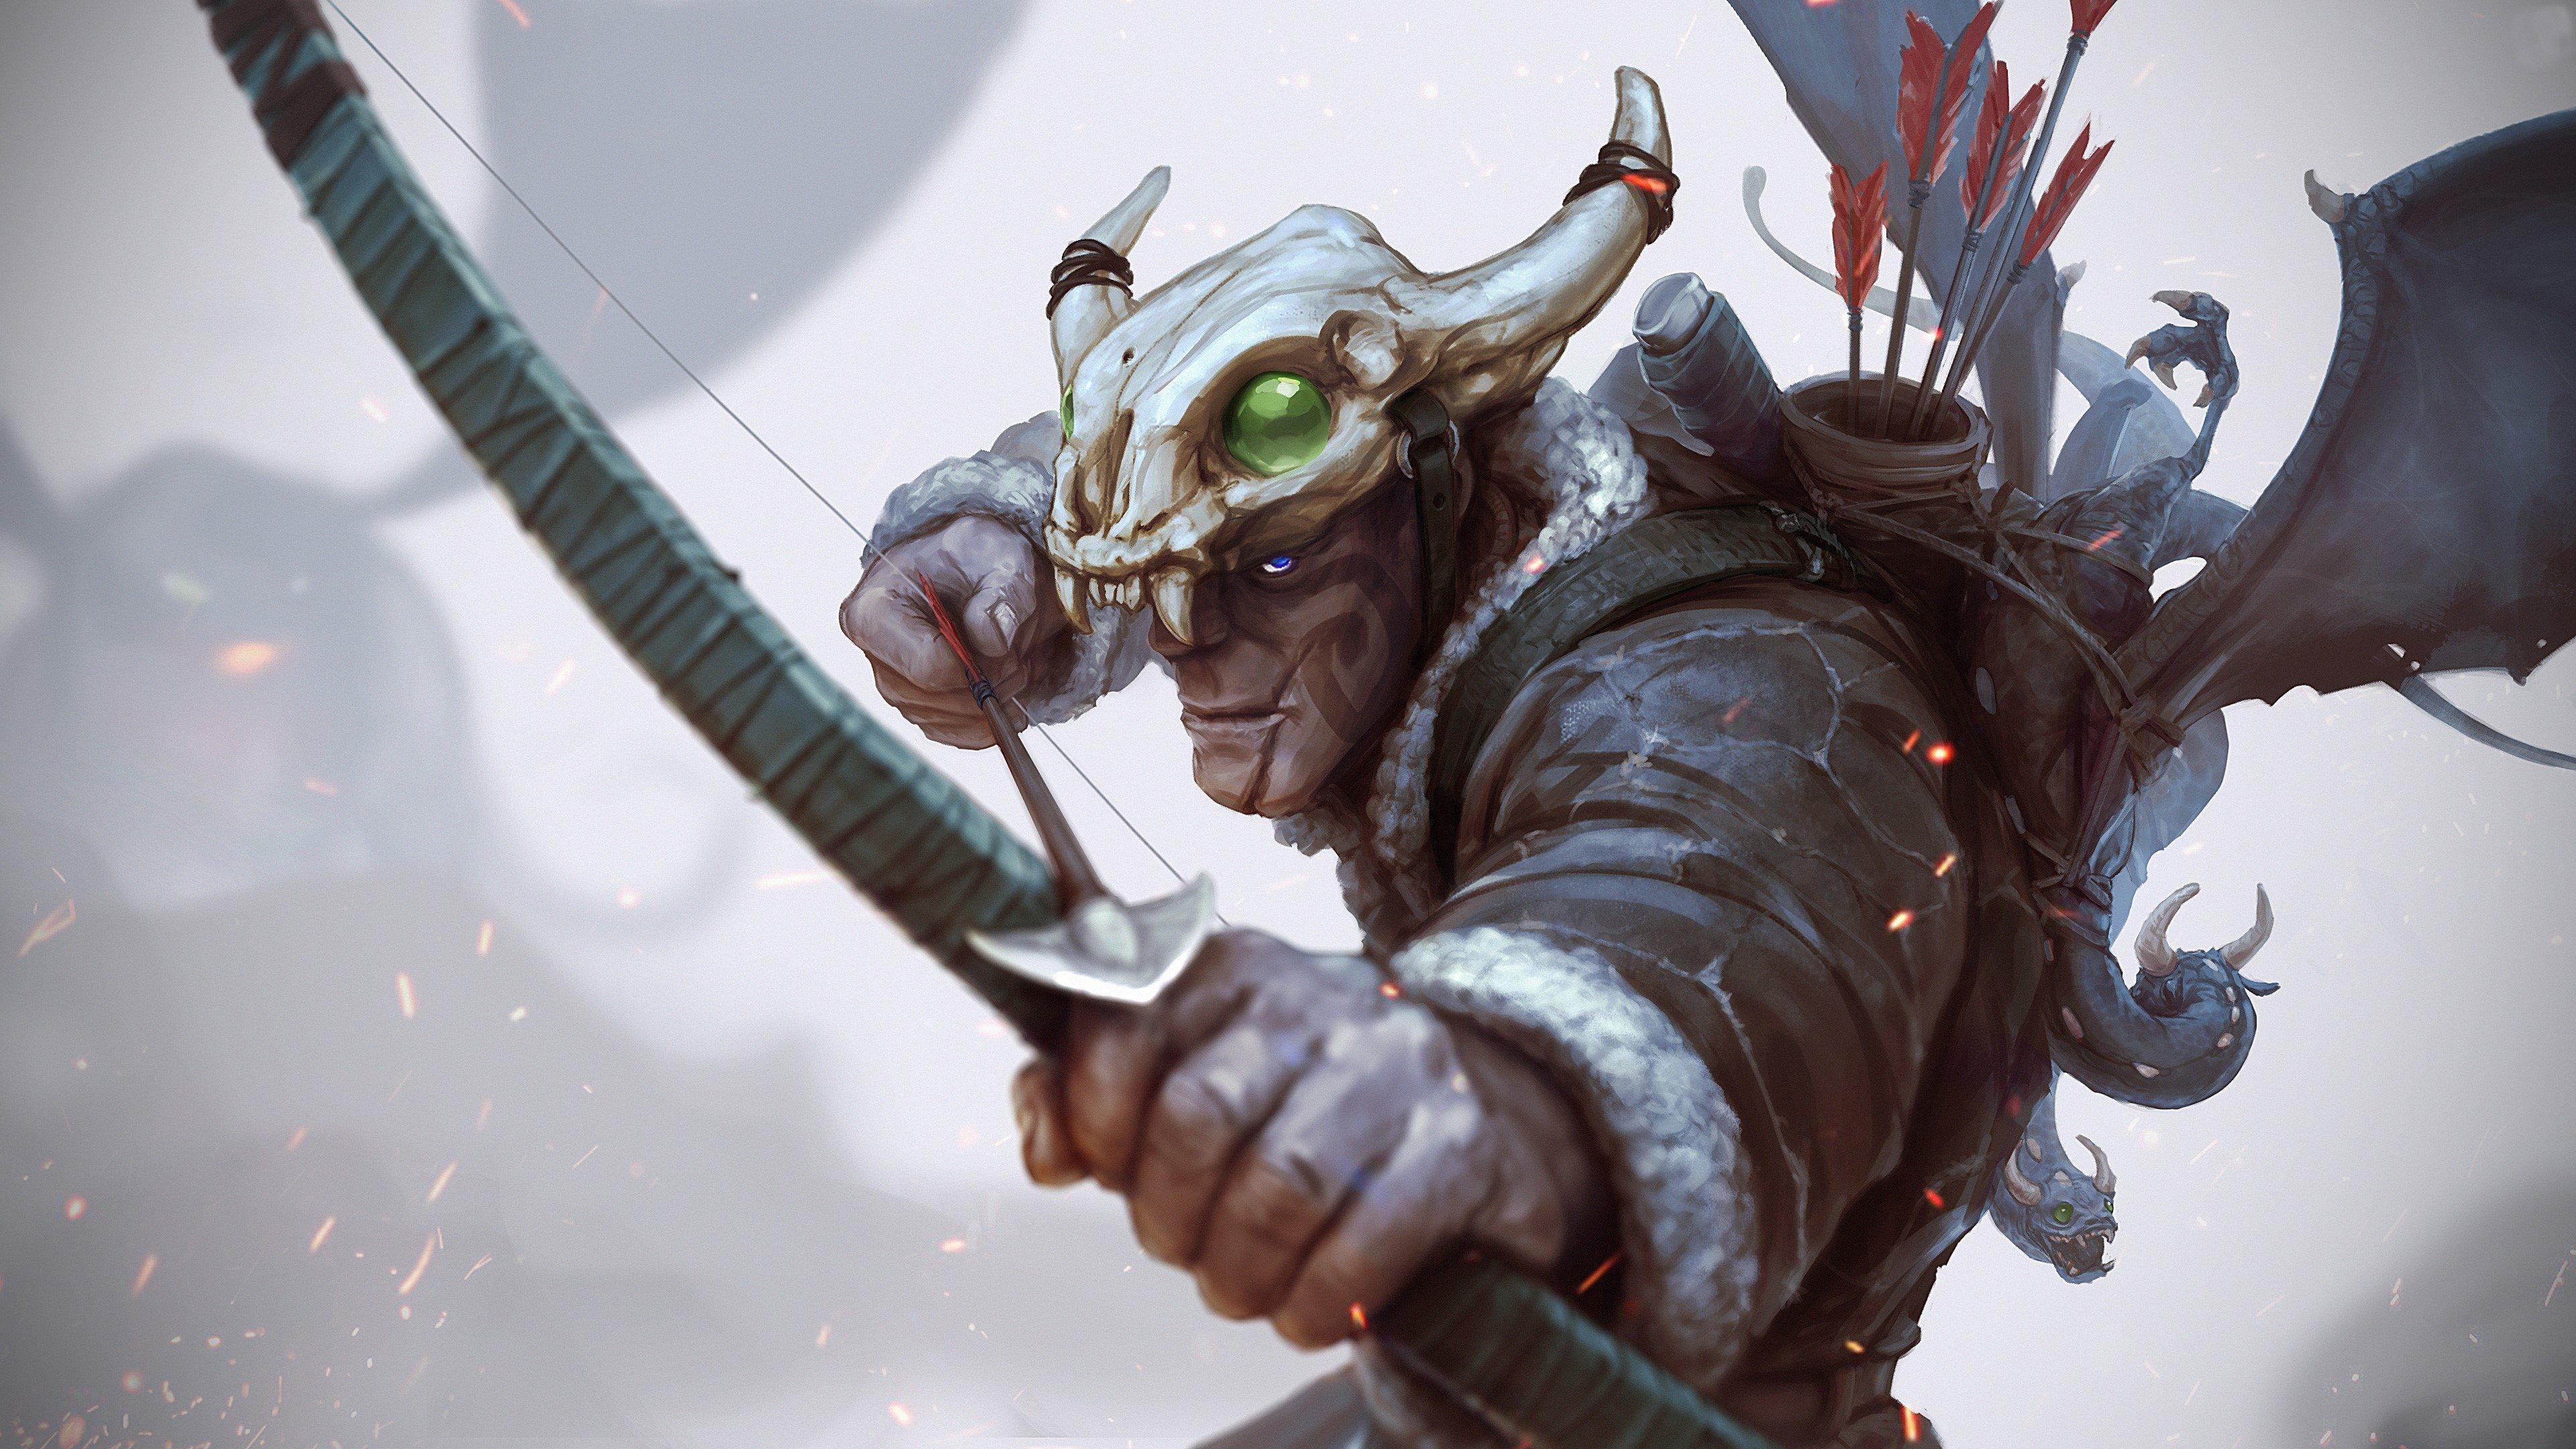 Fondo de pantalla de Arquero cazador Imágenes